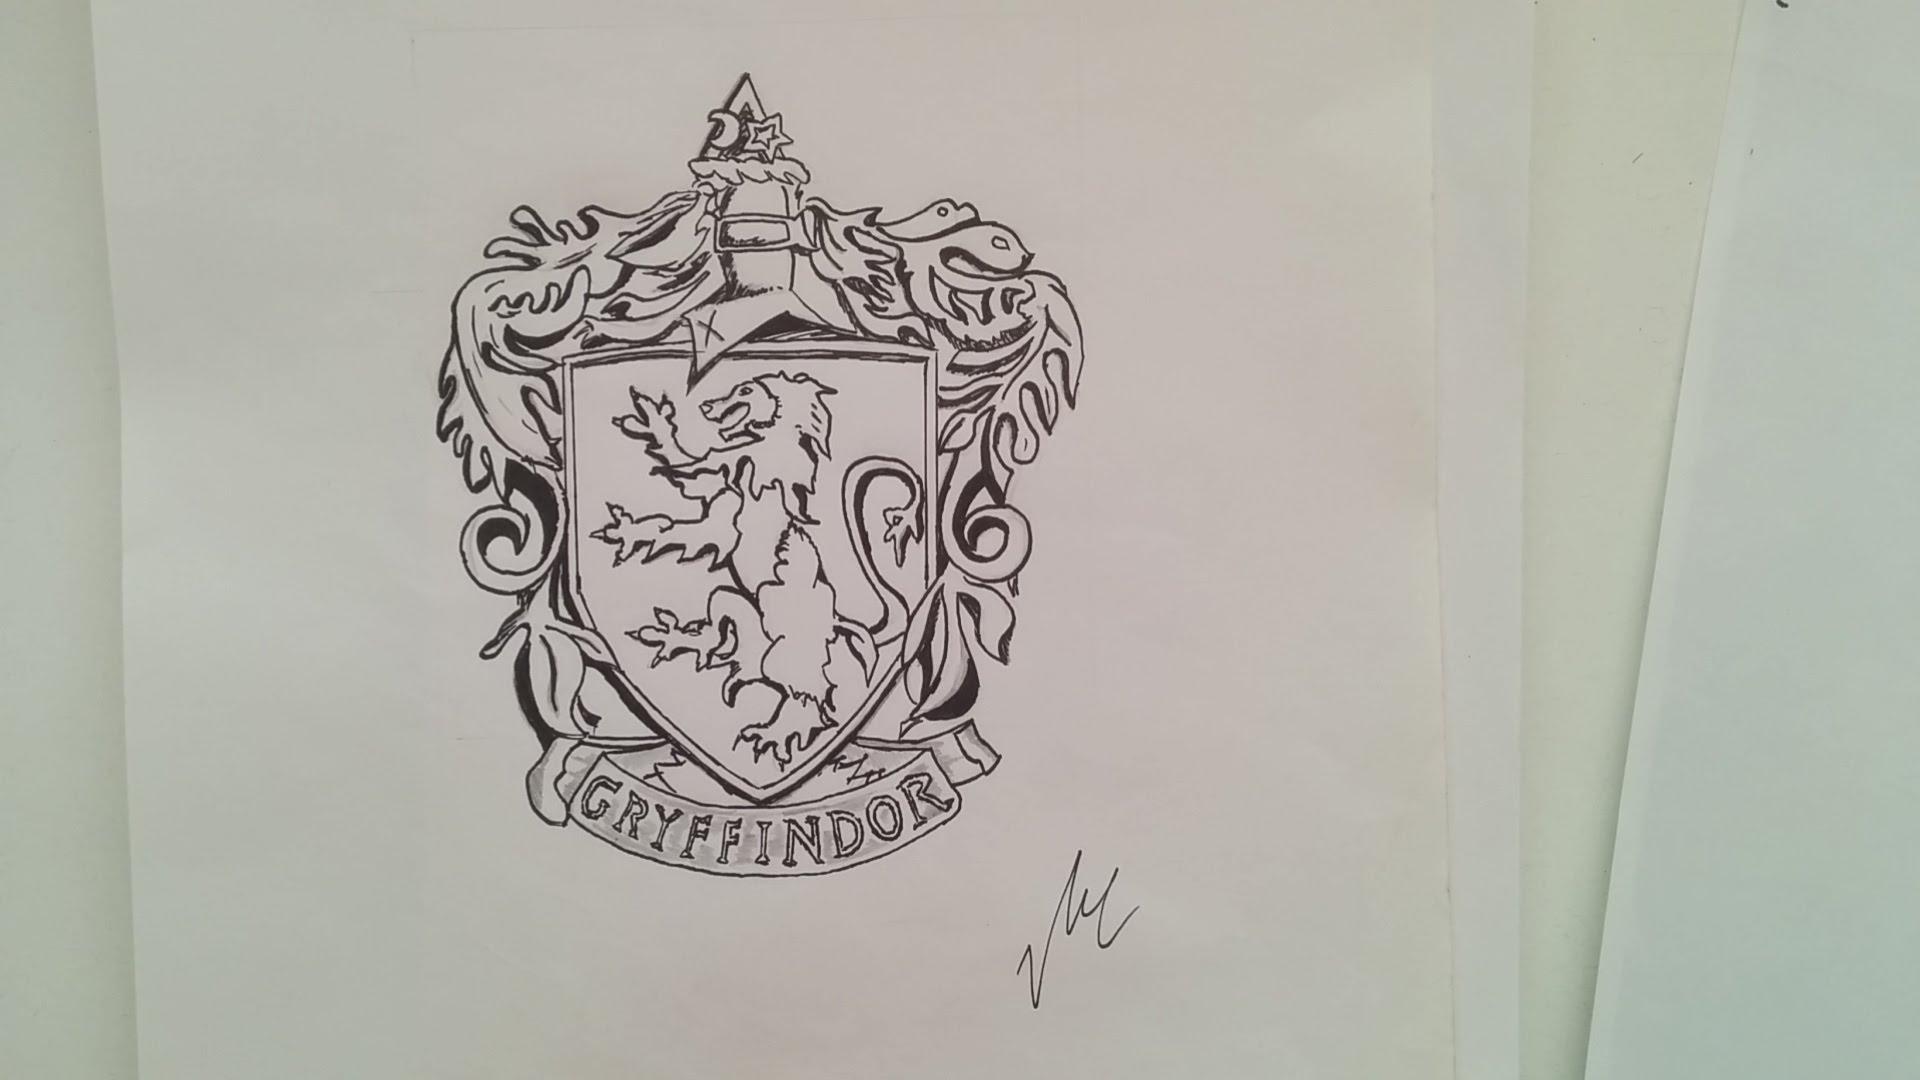 1920x1080 Gryffindor Emblem